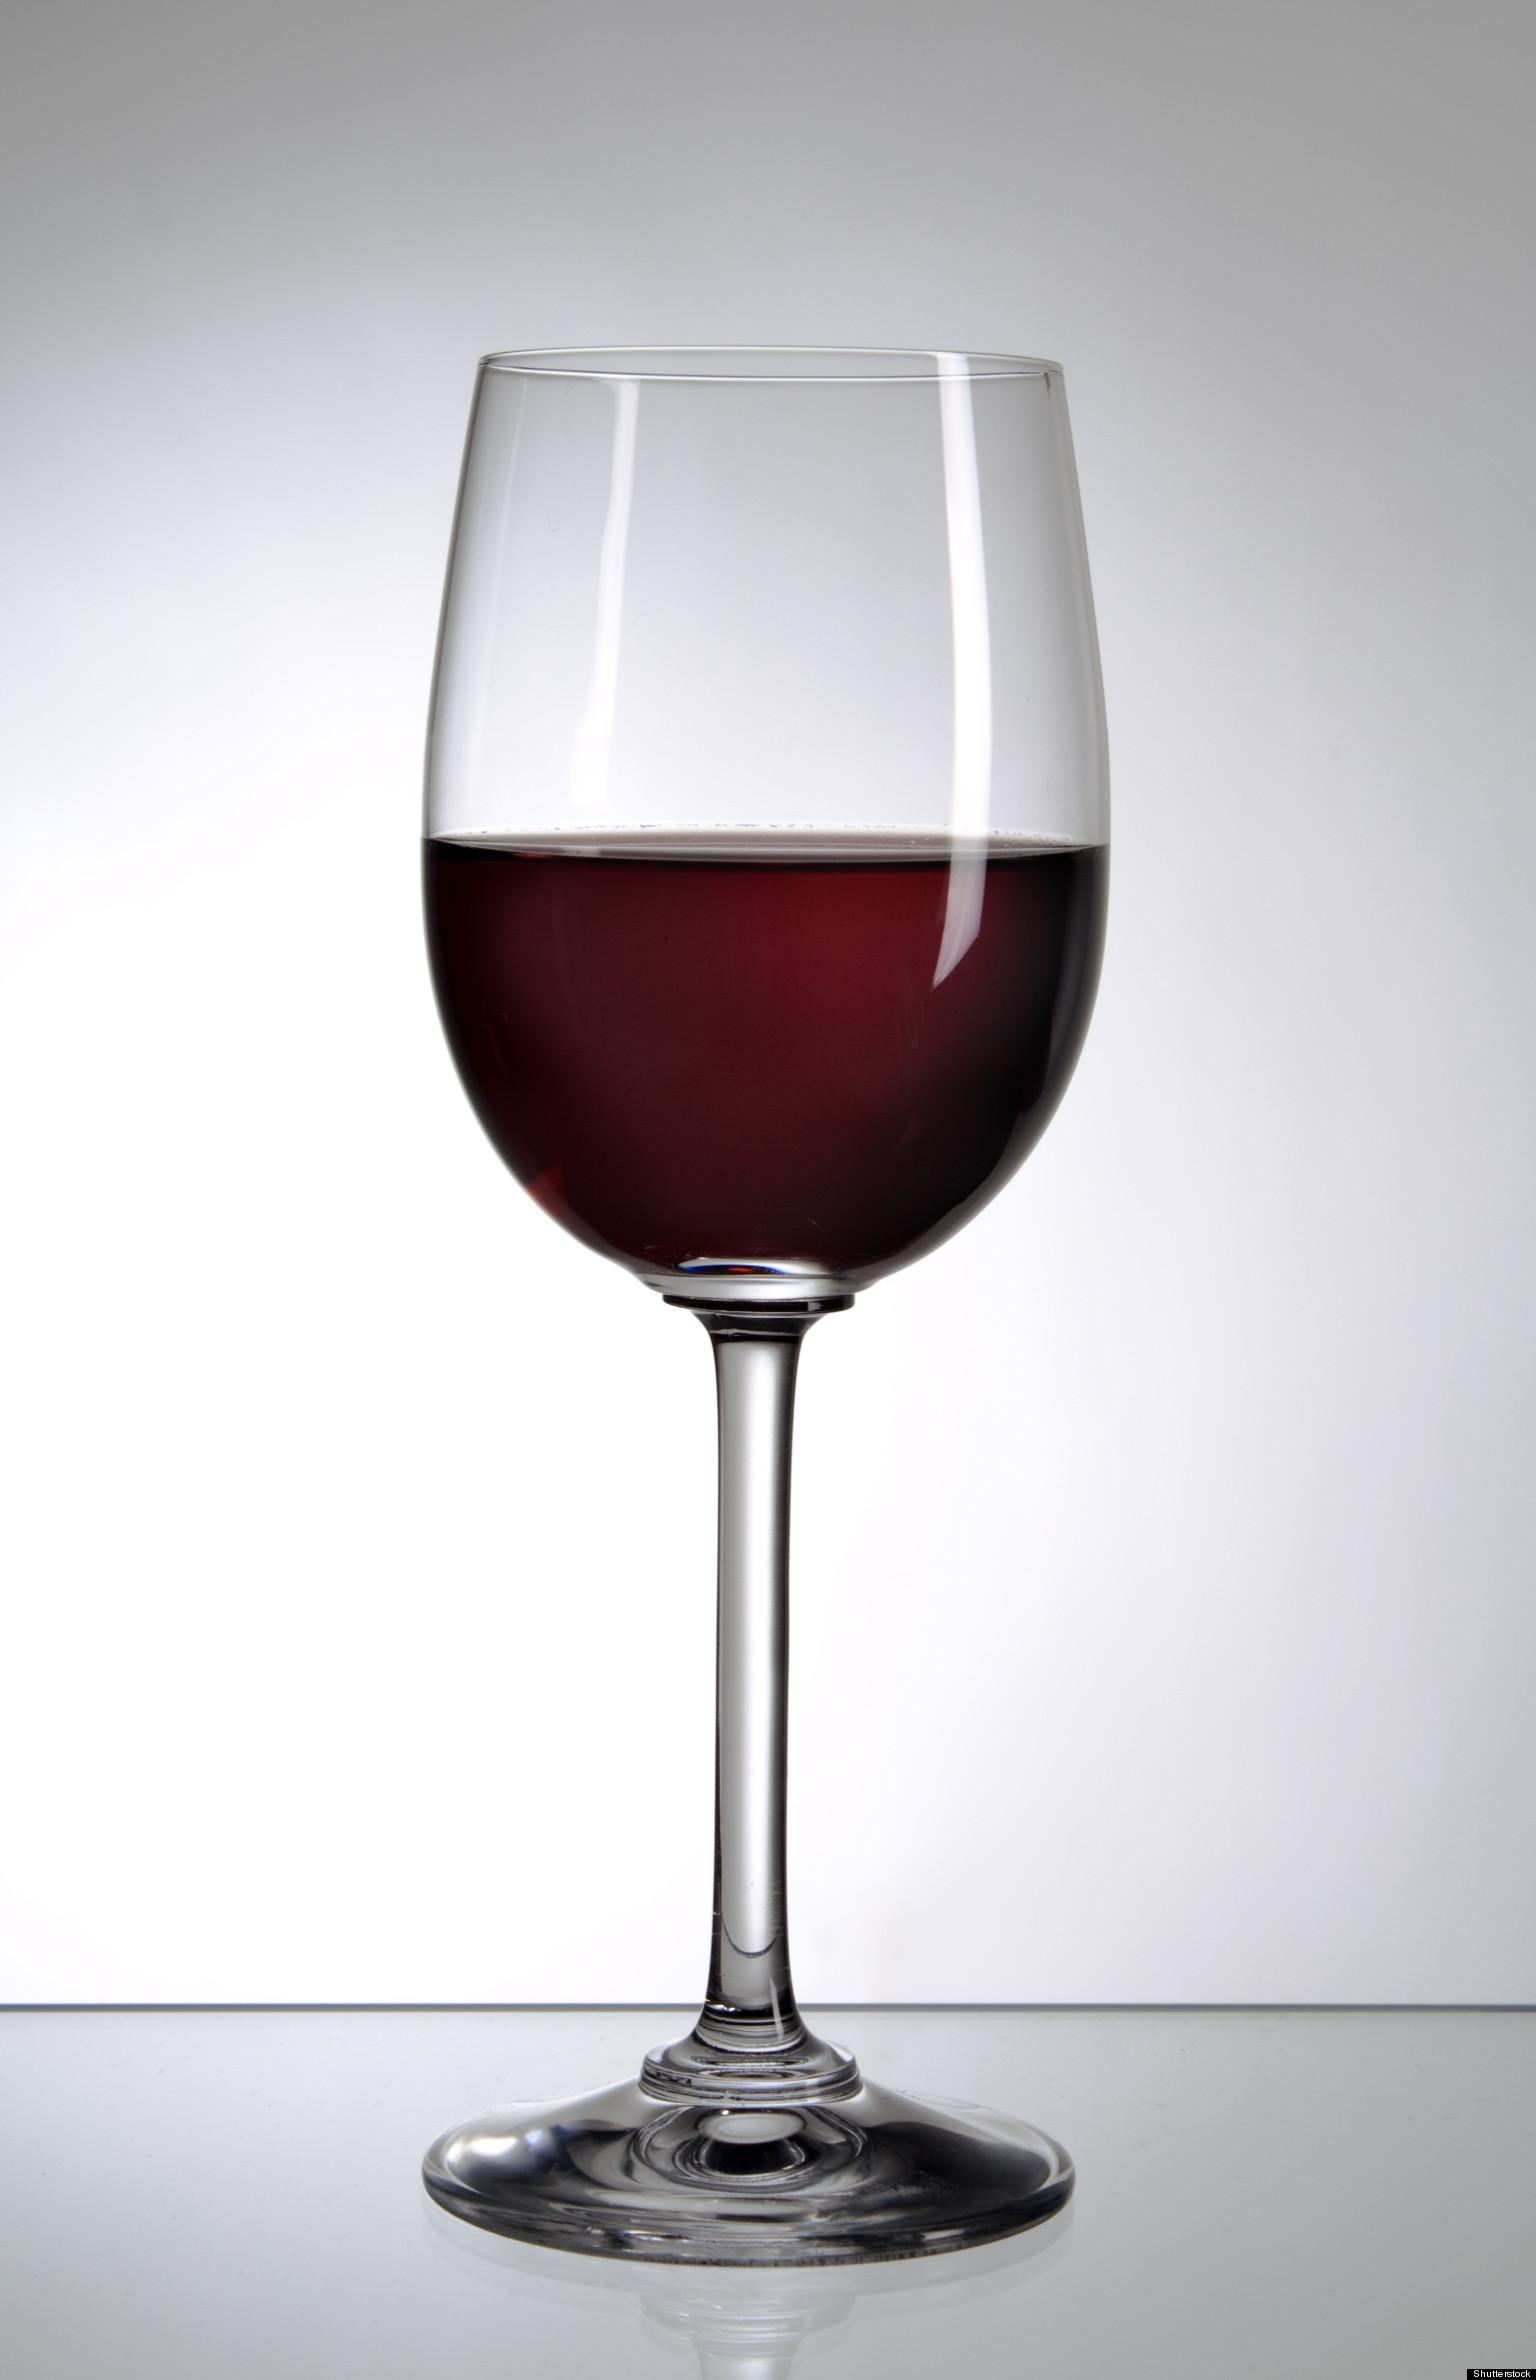 A Glass Half Full Or Half Empty